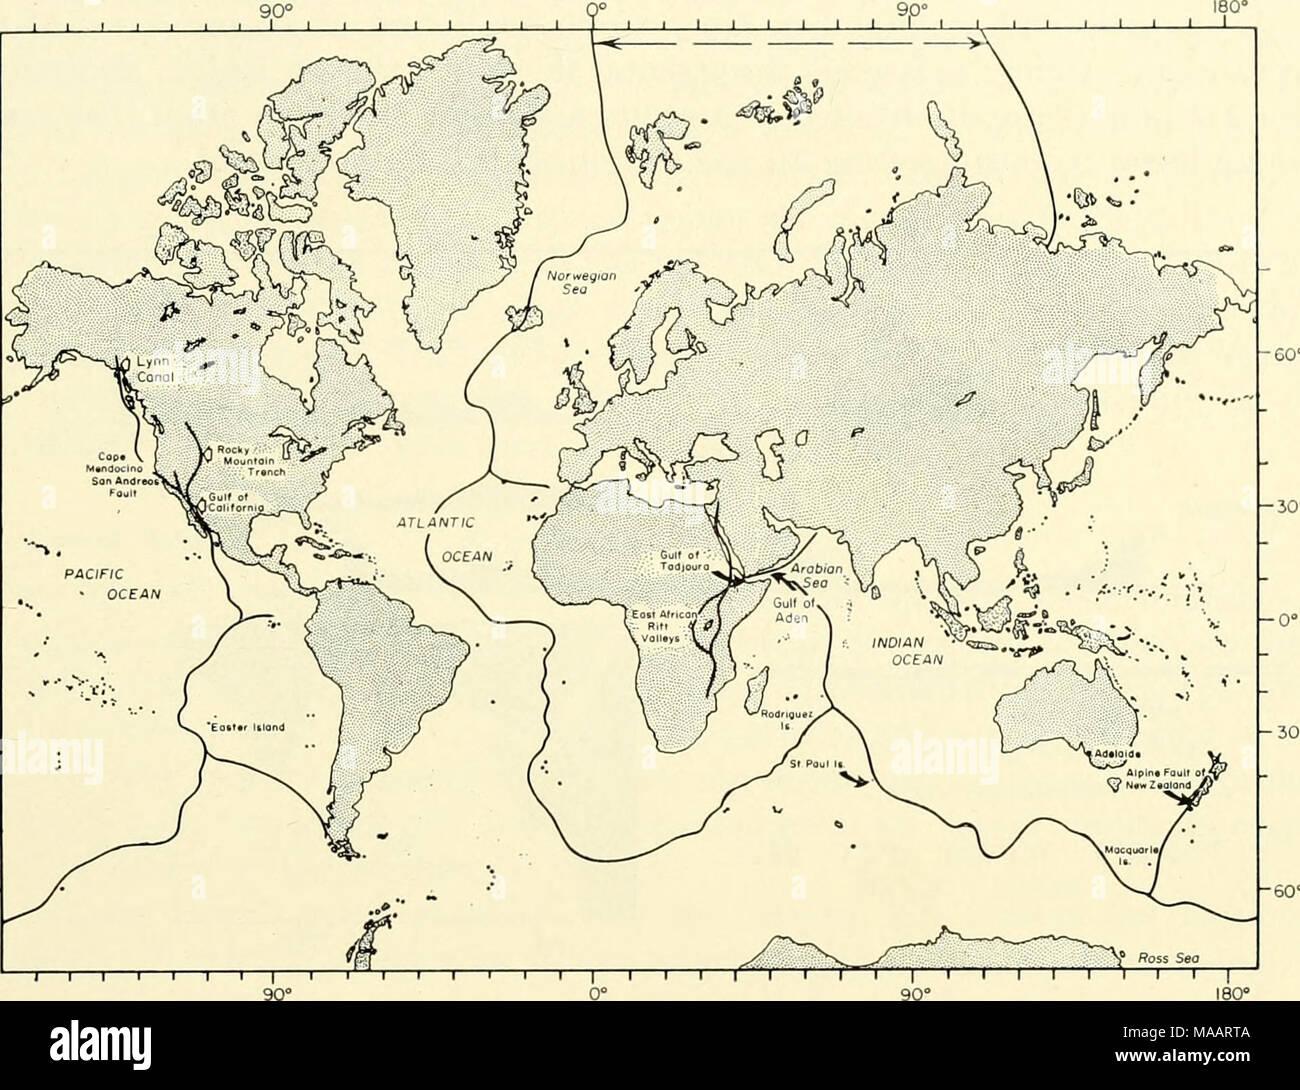 The Earth beneath the sea : History . 60^ 30°- 60° Fig. 5. World on lake victoria world map, east african rift world map, congo basin world map, gondwana world map, appalachian mountain range world map, golan heights world map, pyrenees world map, rift valley on world map, red sea world map, mt. kilimanjaro world map, olduvai gorge world map, saint lawrence river world map, 3rd millennium bc world map, ethiopian highlands world map, serengeti world map, kalahari desert world map, niger river world map, erta ale world map, swahili coast world map, altai mountains world map,